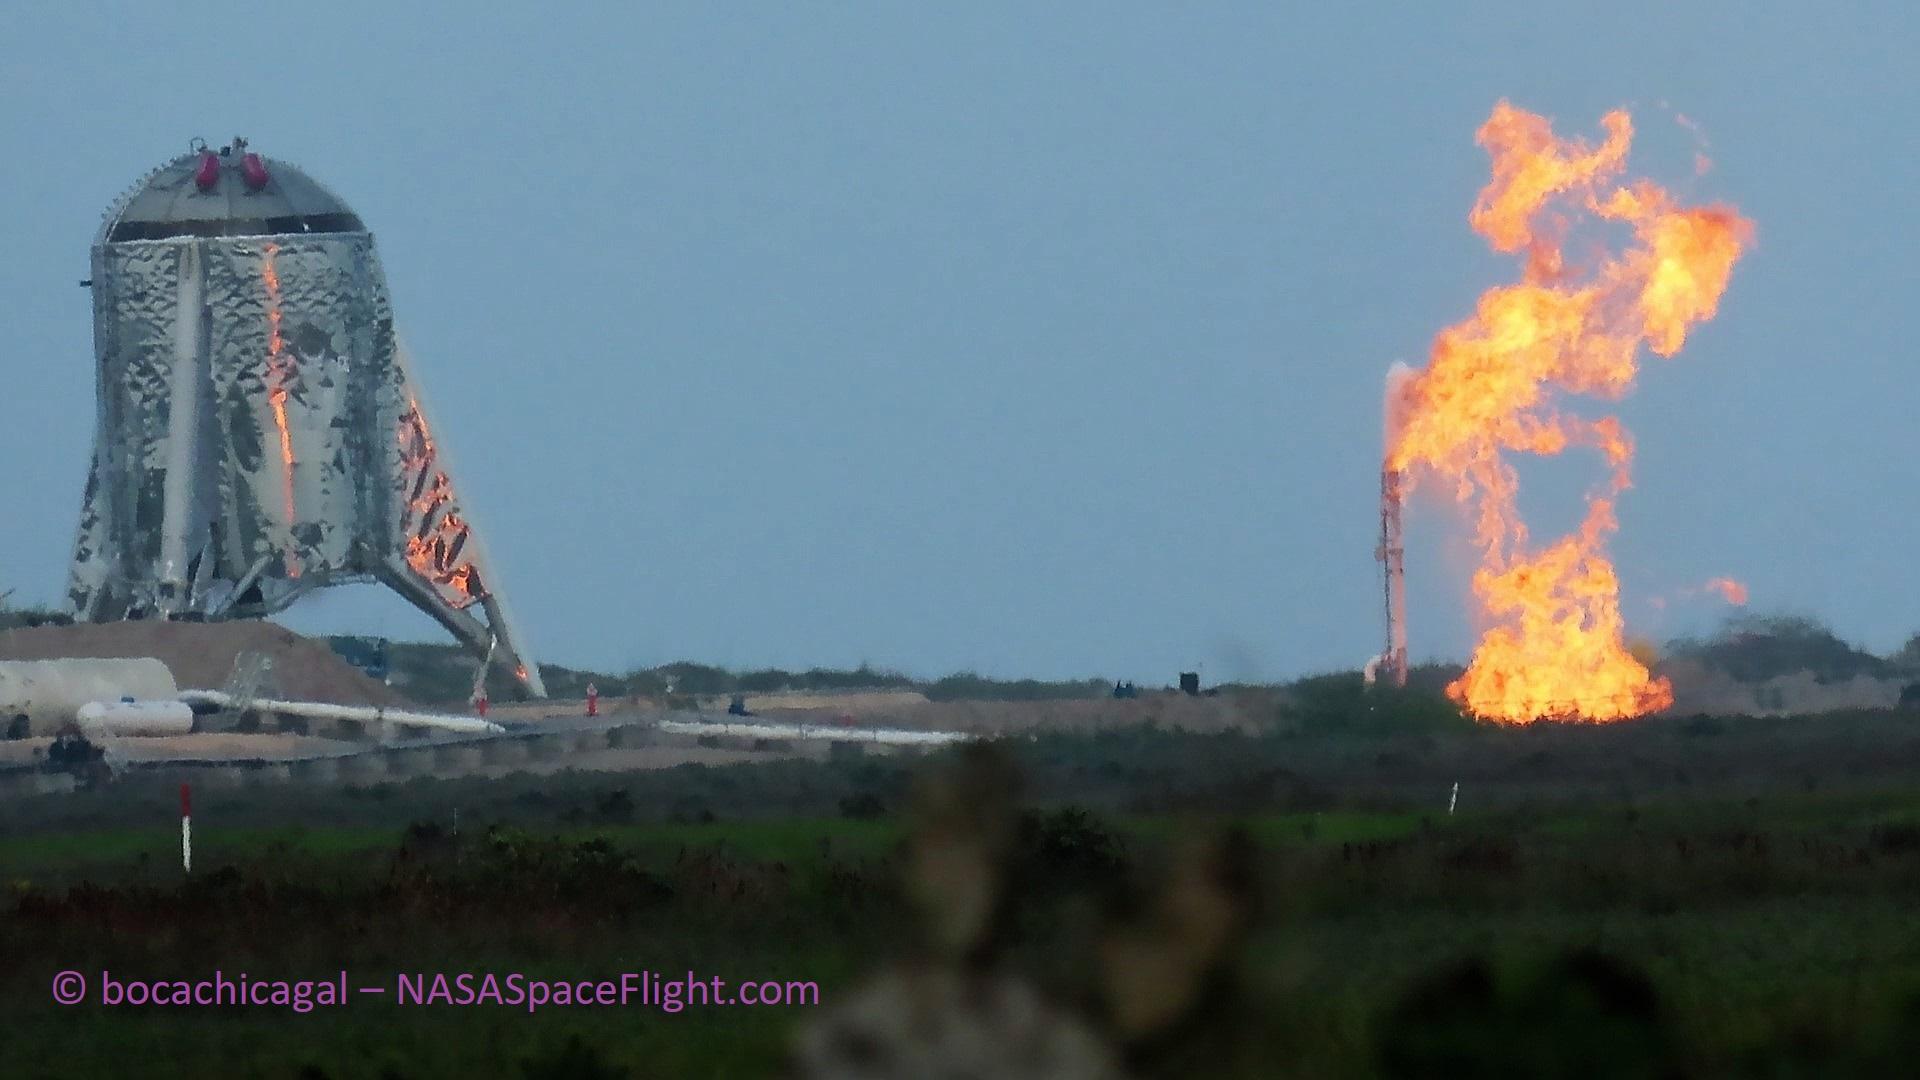 Boca Chica Starhopper testing 033019 (NASASpaceflight – bocachicagal) 3